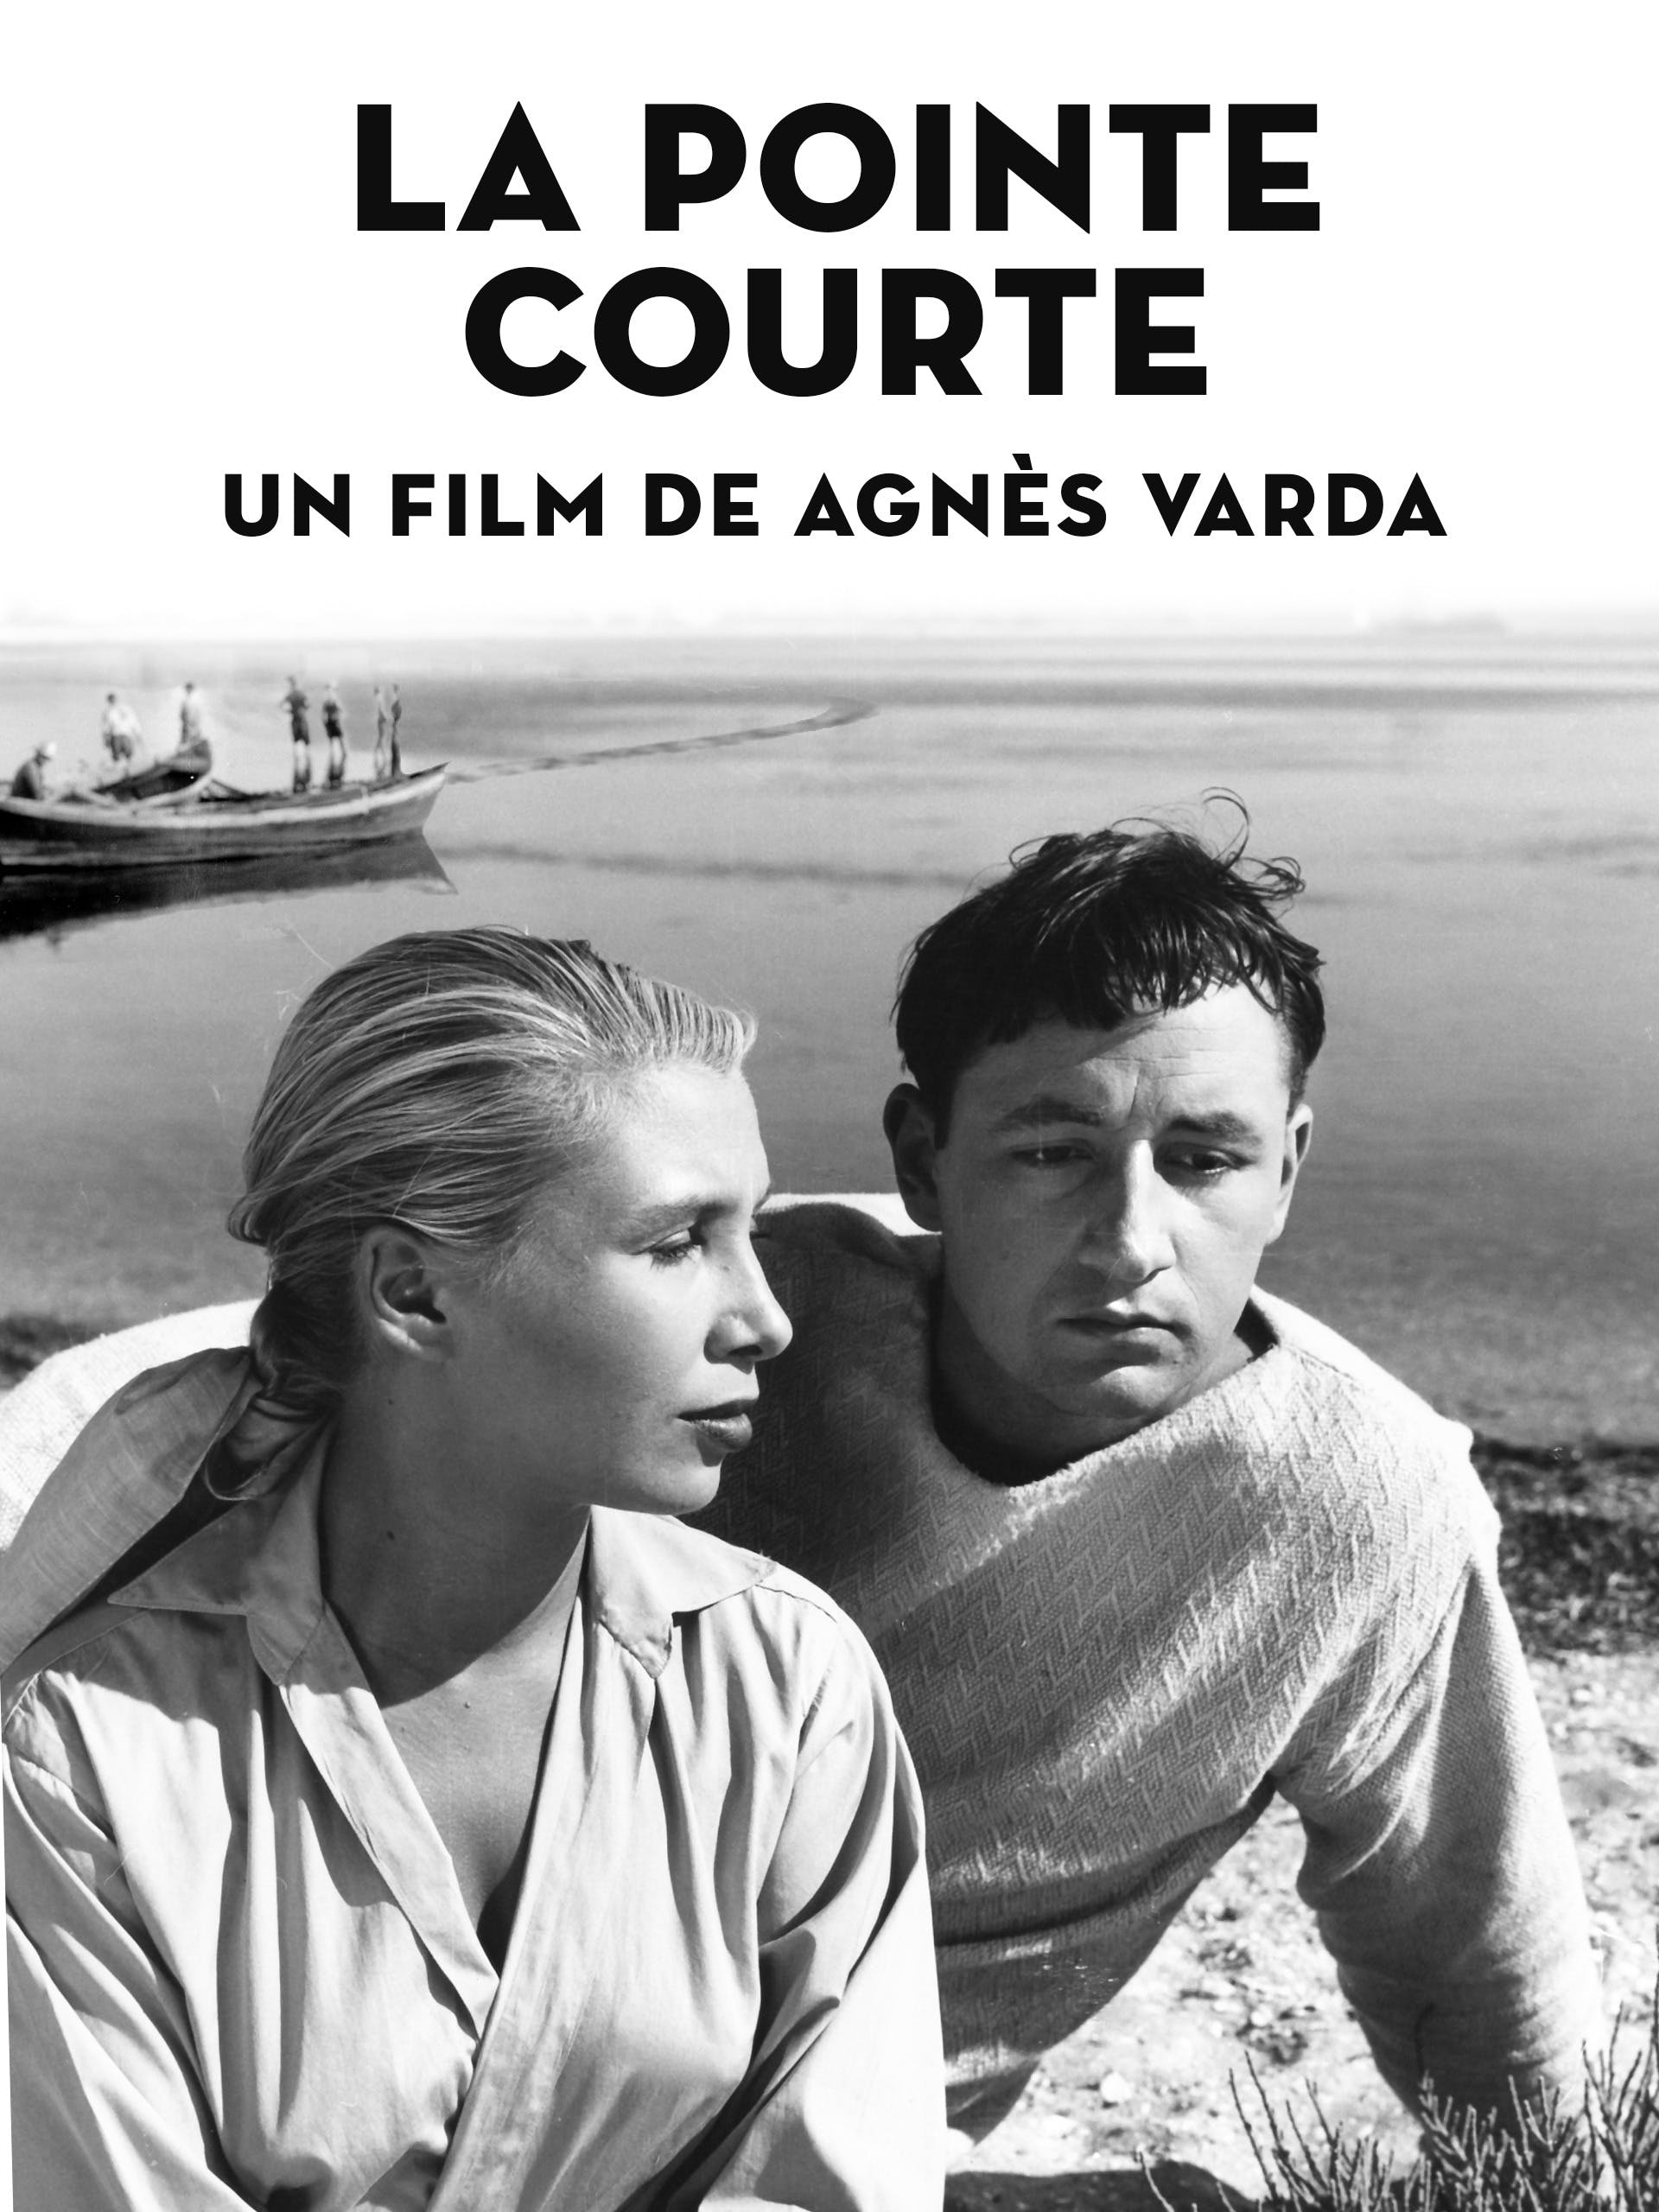 Agnès Varda - La pointe courte - Film